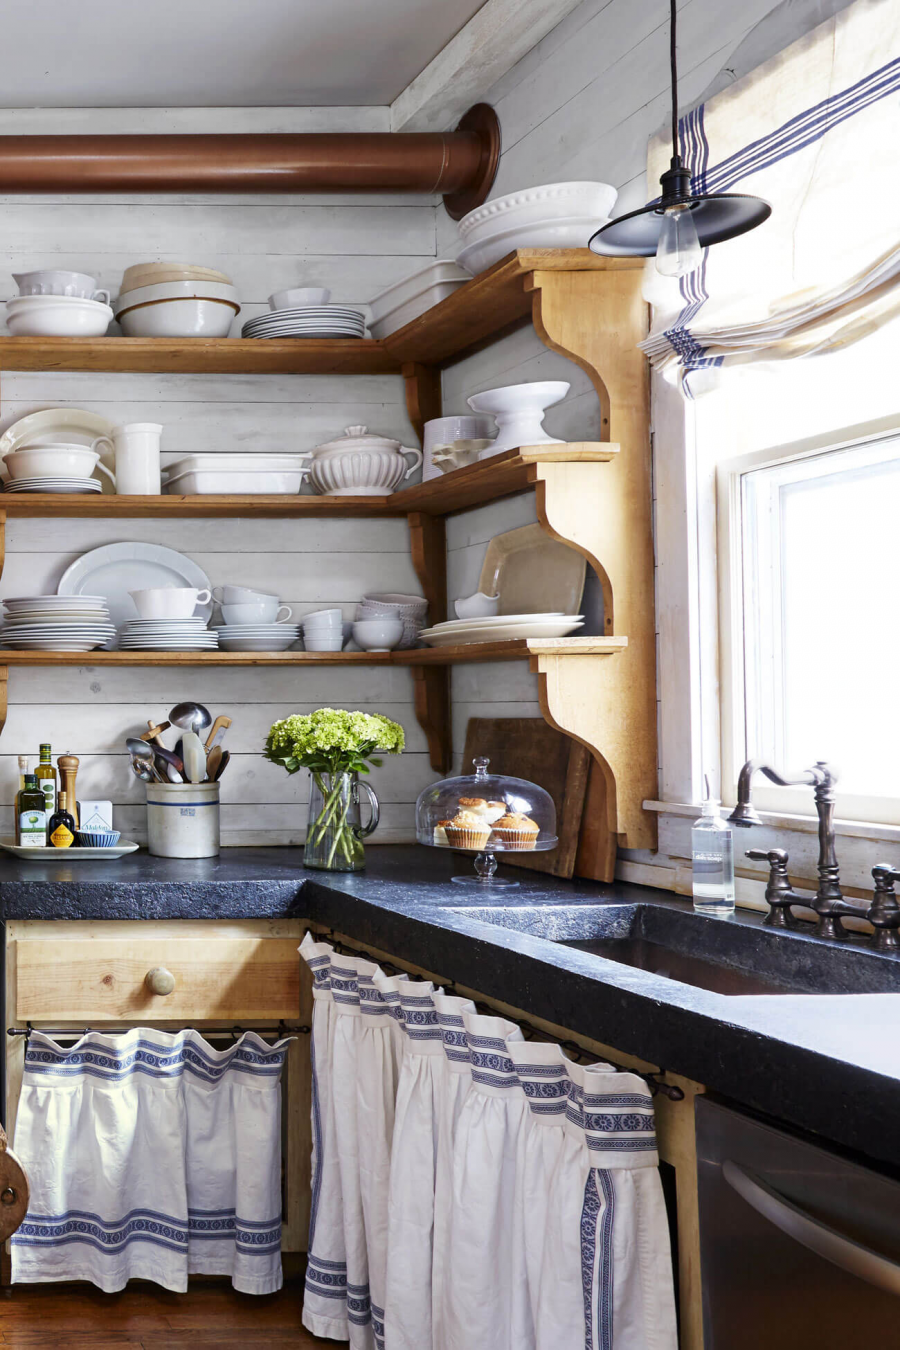 Idei de amenajare a bucatariei in stil rustic - Poza 10